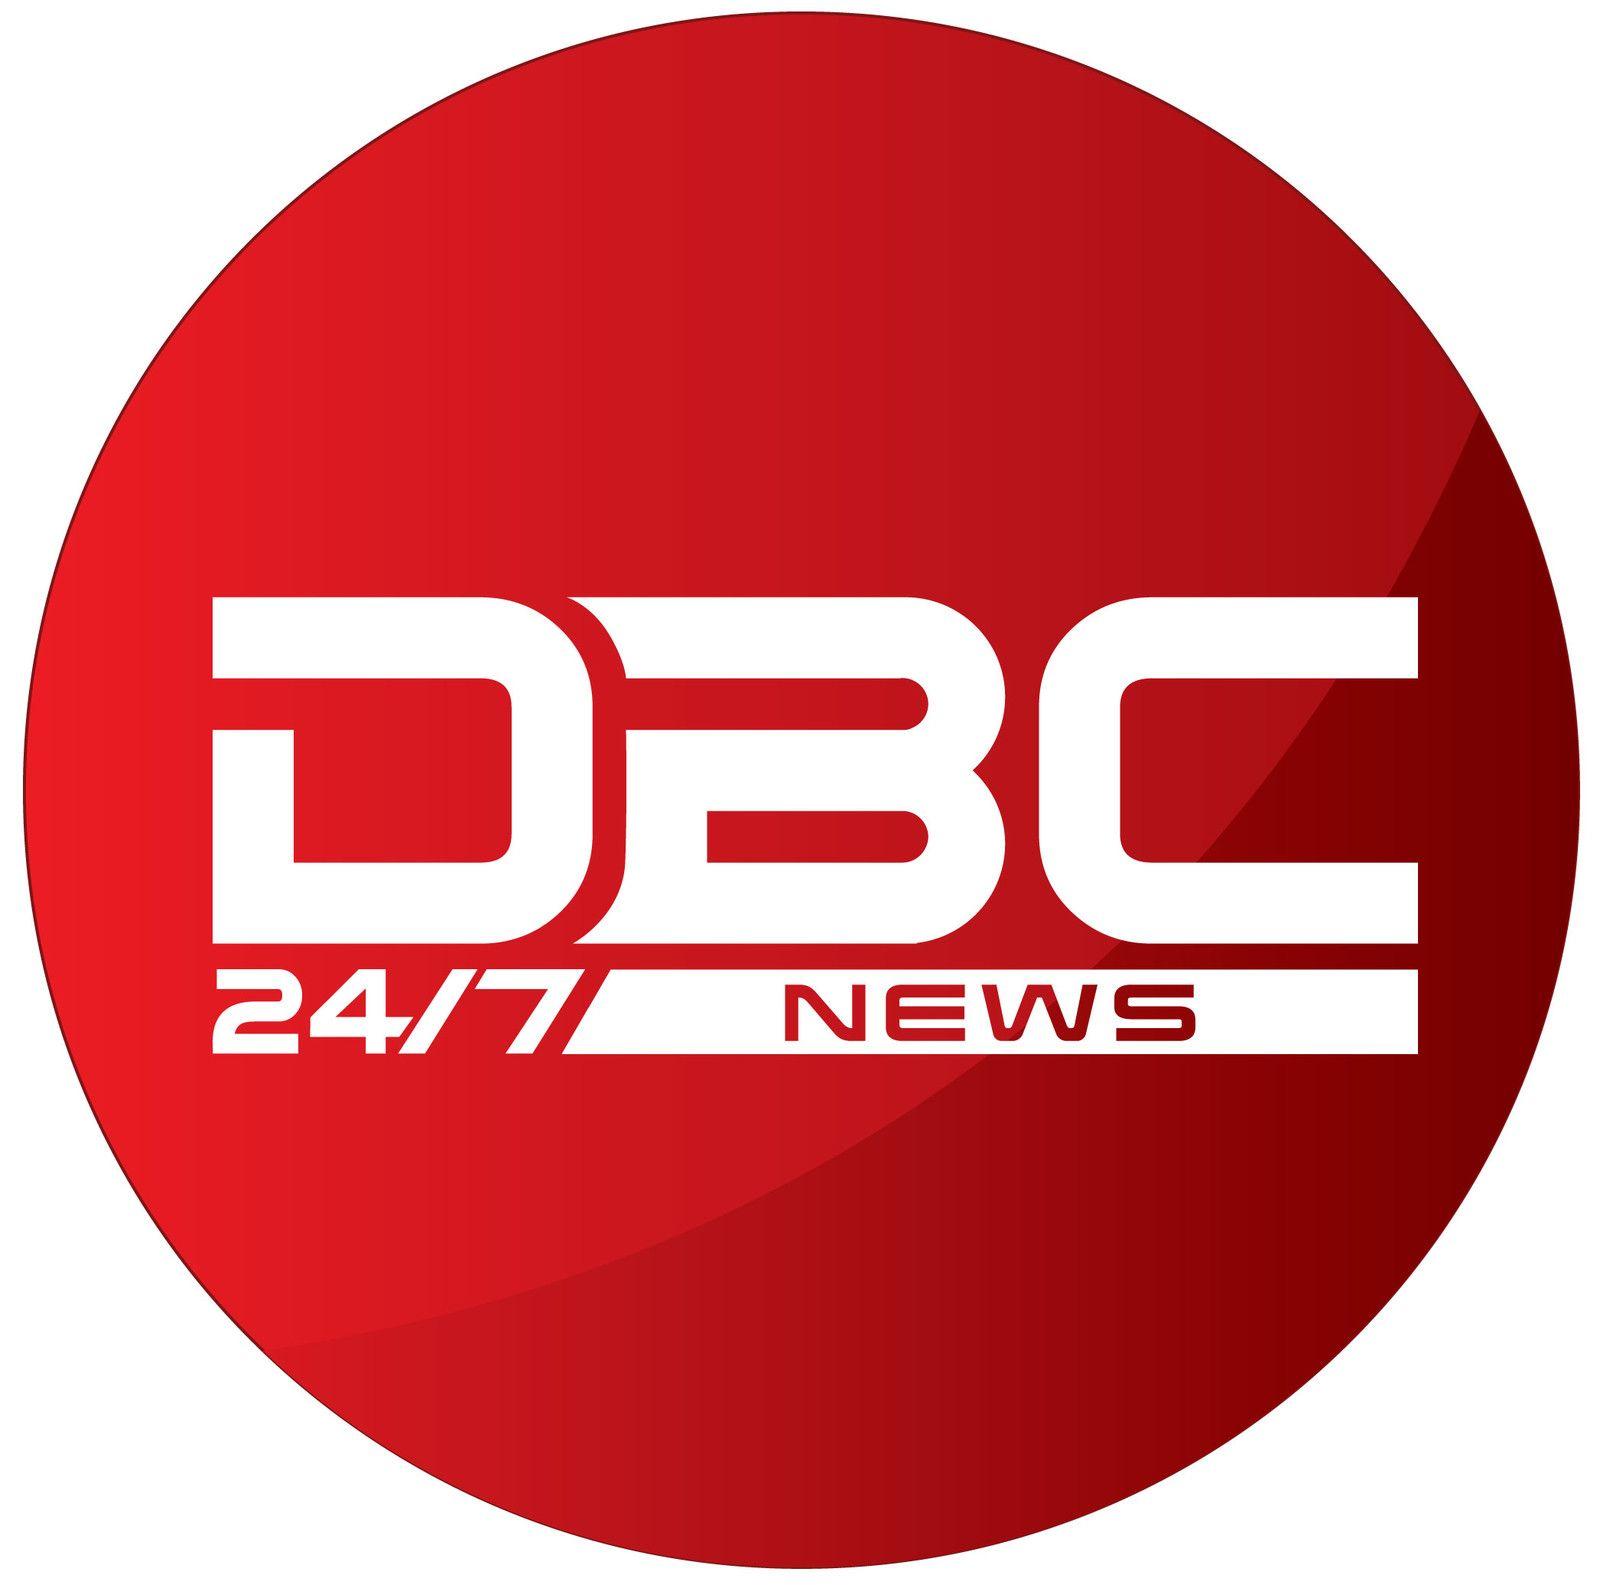 Dbc News Dhaka Bangladesh Logo Design By Sadek Ahmed Www Sadekahmed Com Dbc News Live 24 7 On Artstation At Https Ww Logo Design Logos Channel Logo